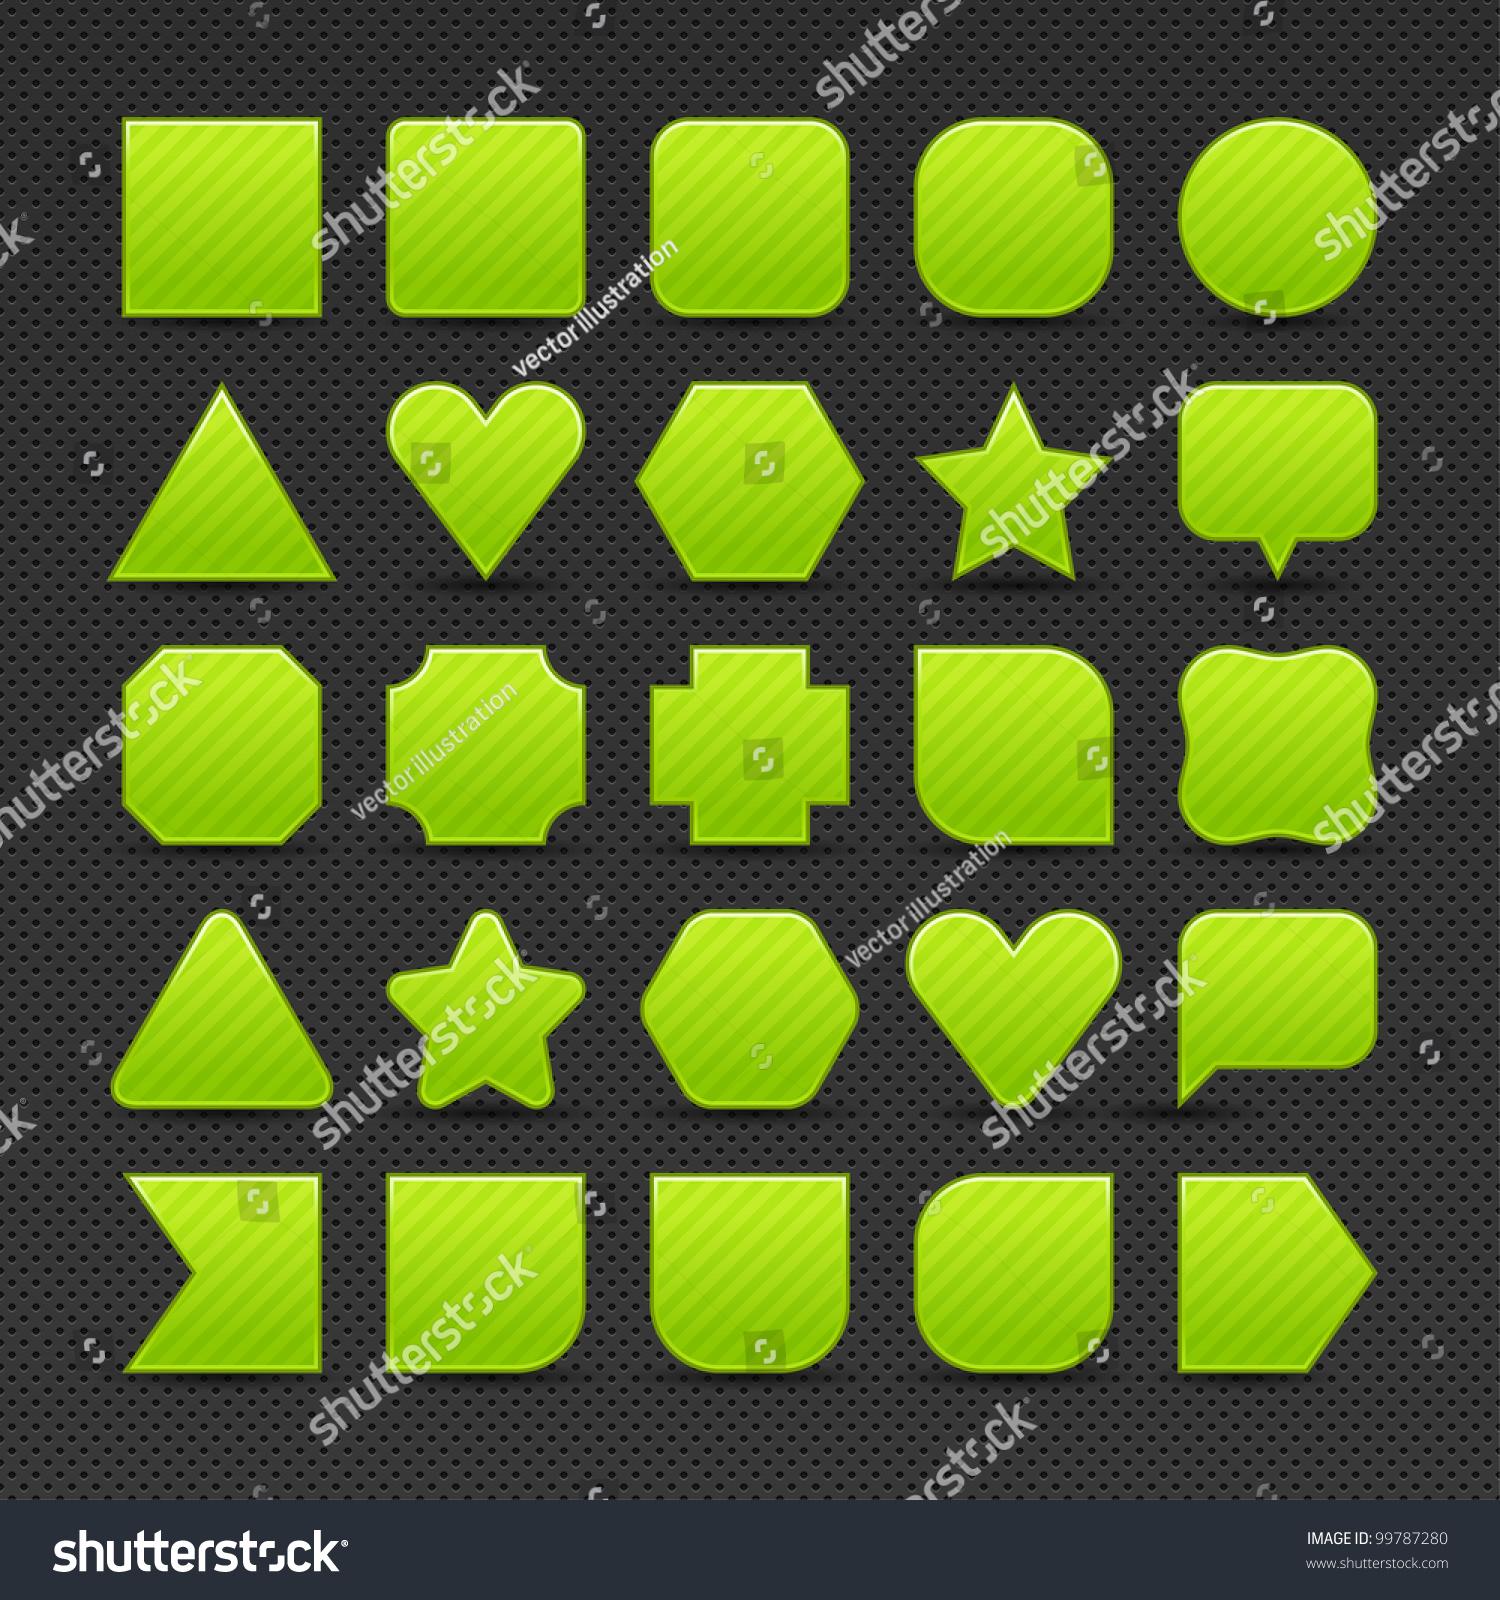 25 Variations Form Green Button Light Stock Vector 99787280 ...